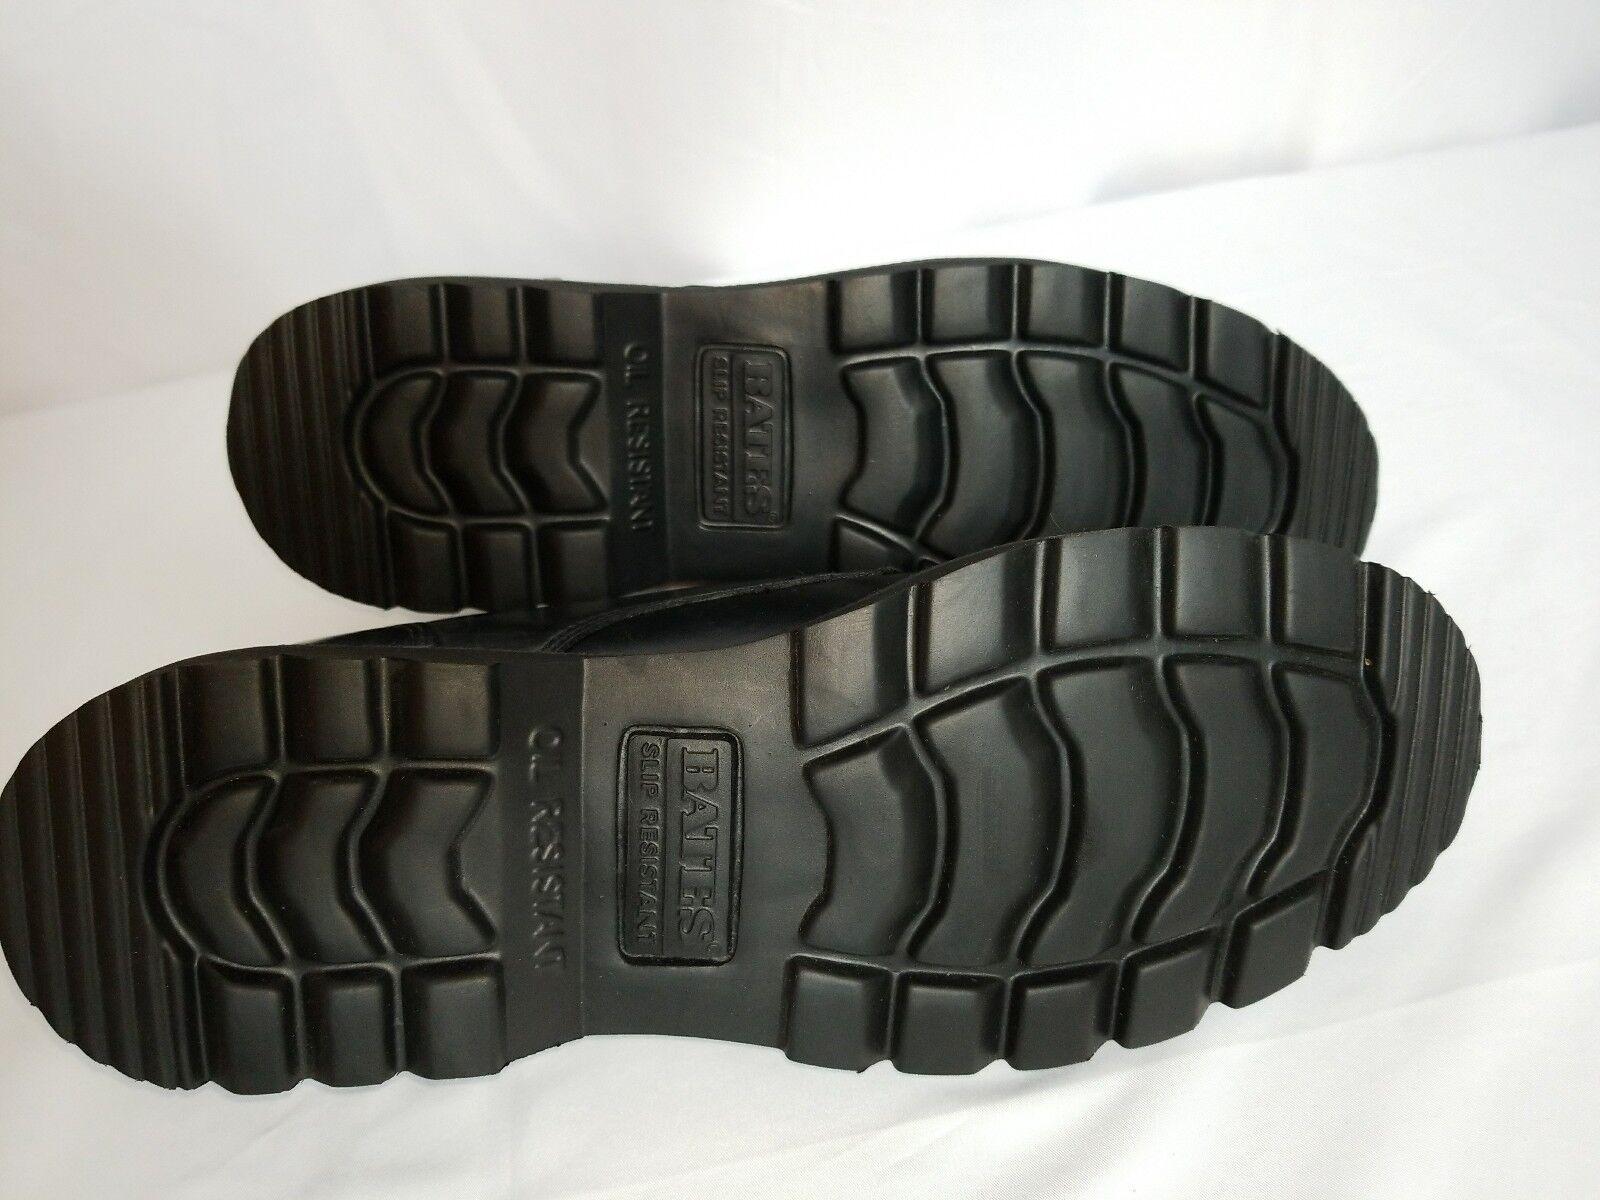 Bates Enforcer Series M Black Hi-Gloss Duty OxfordMen's 7.5 M Series Work/Dress New 513ac1